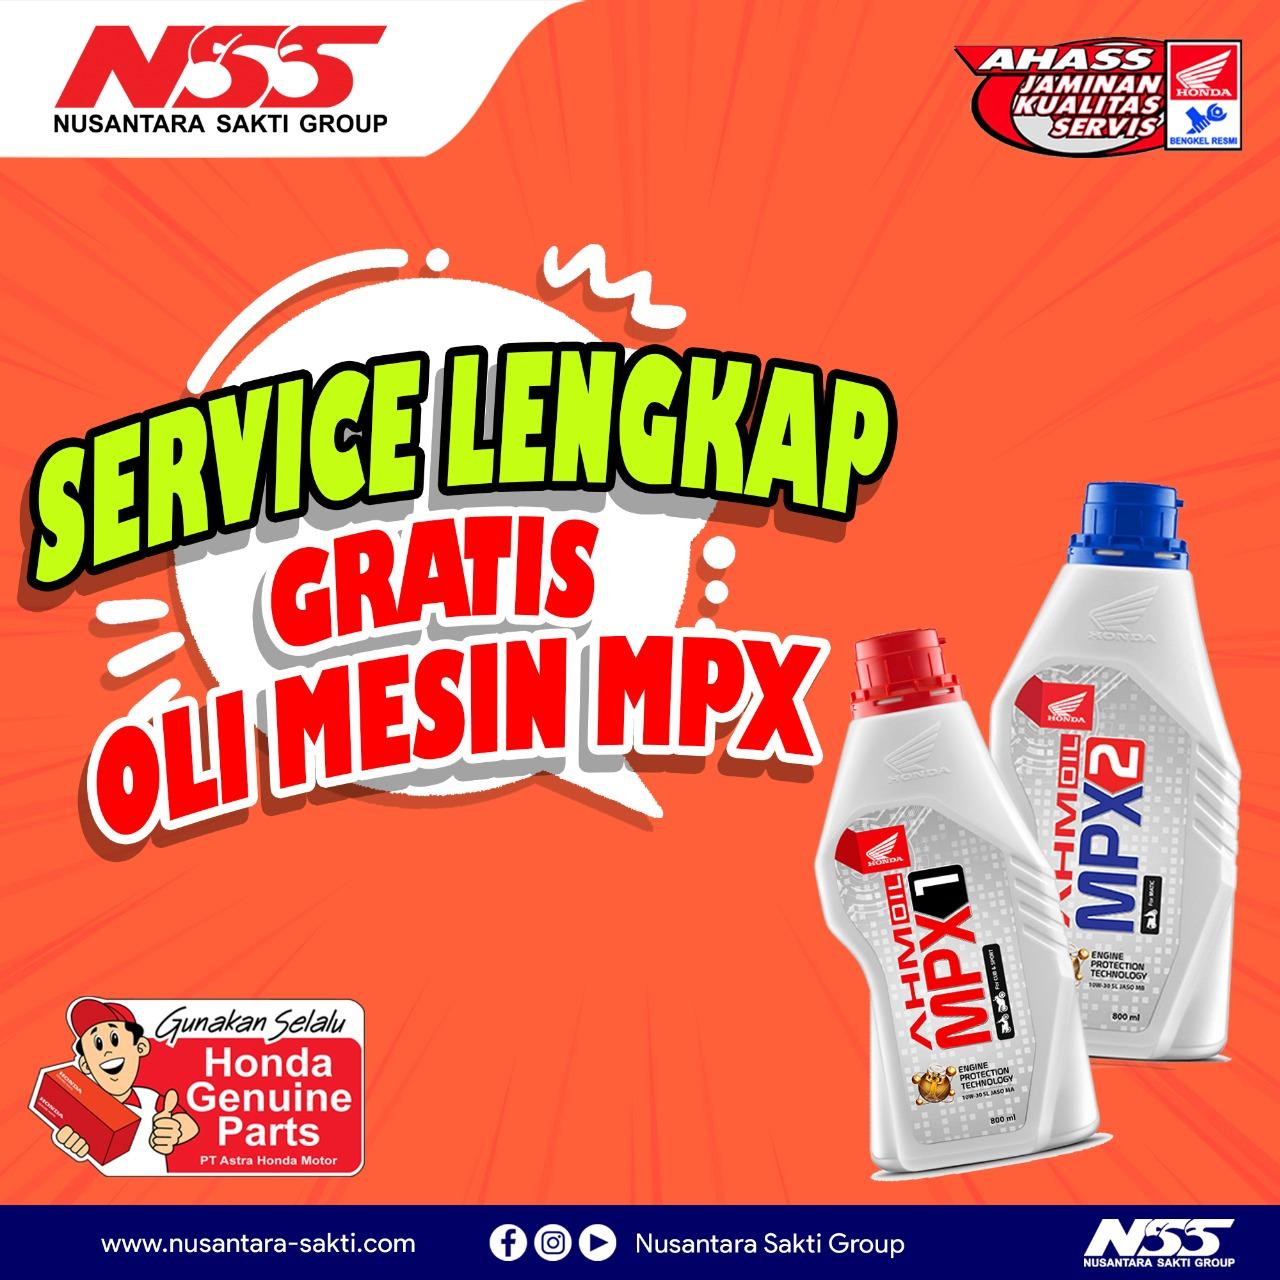 Promo Servis lengkap gratis oli mesin mpx